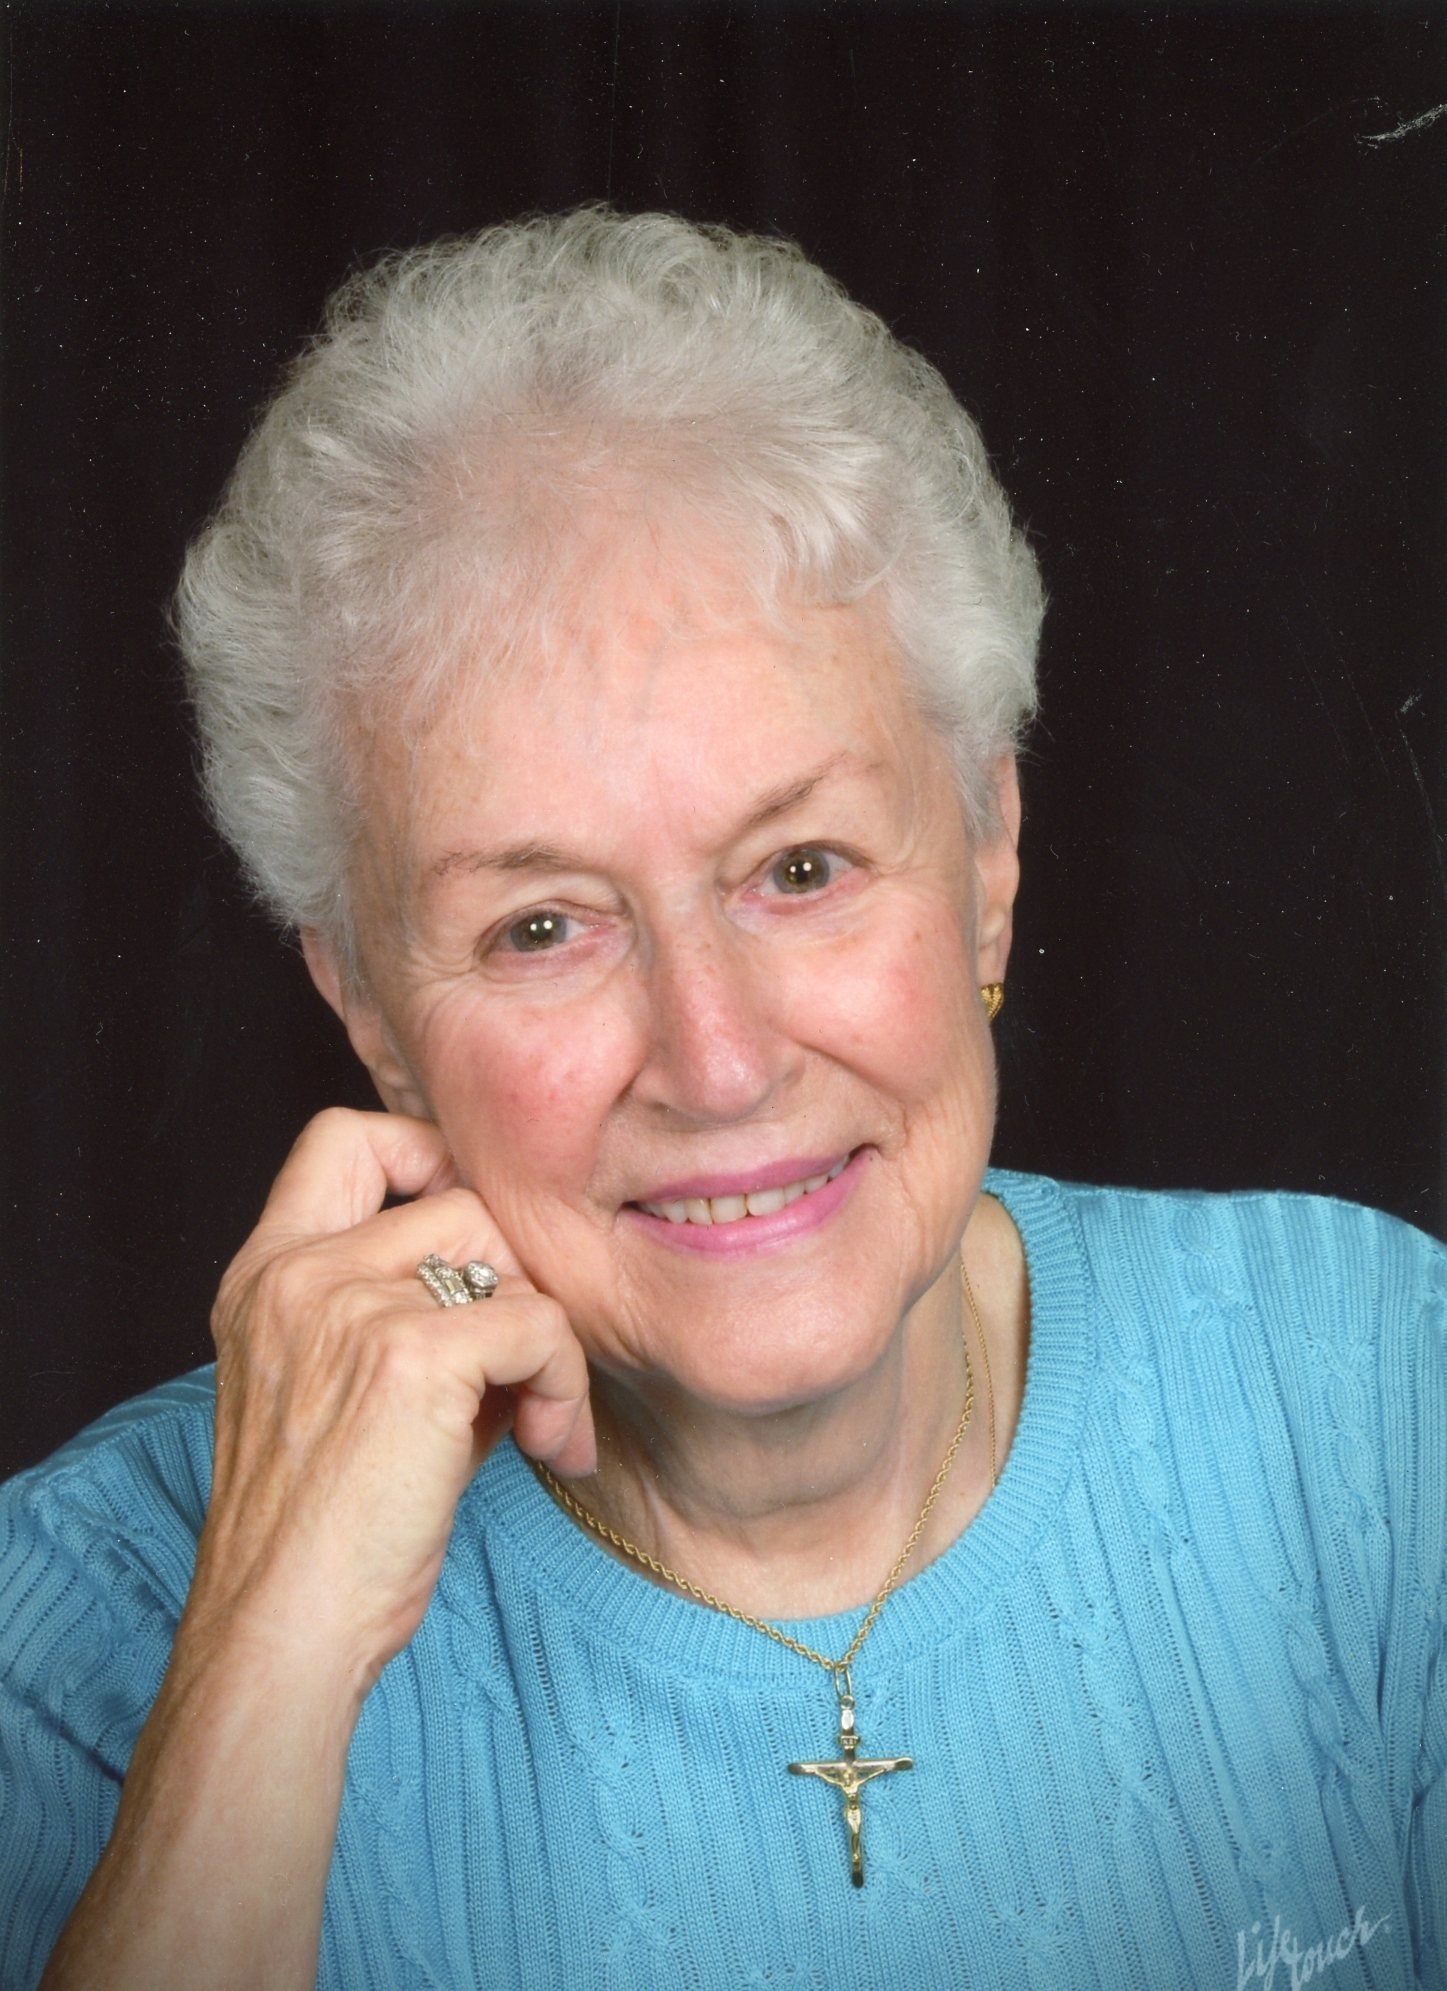 Joan Shawlee,Maureen Lipman (born 1946) Adult image Toni Ann Gisondi,Sheryl Munks